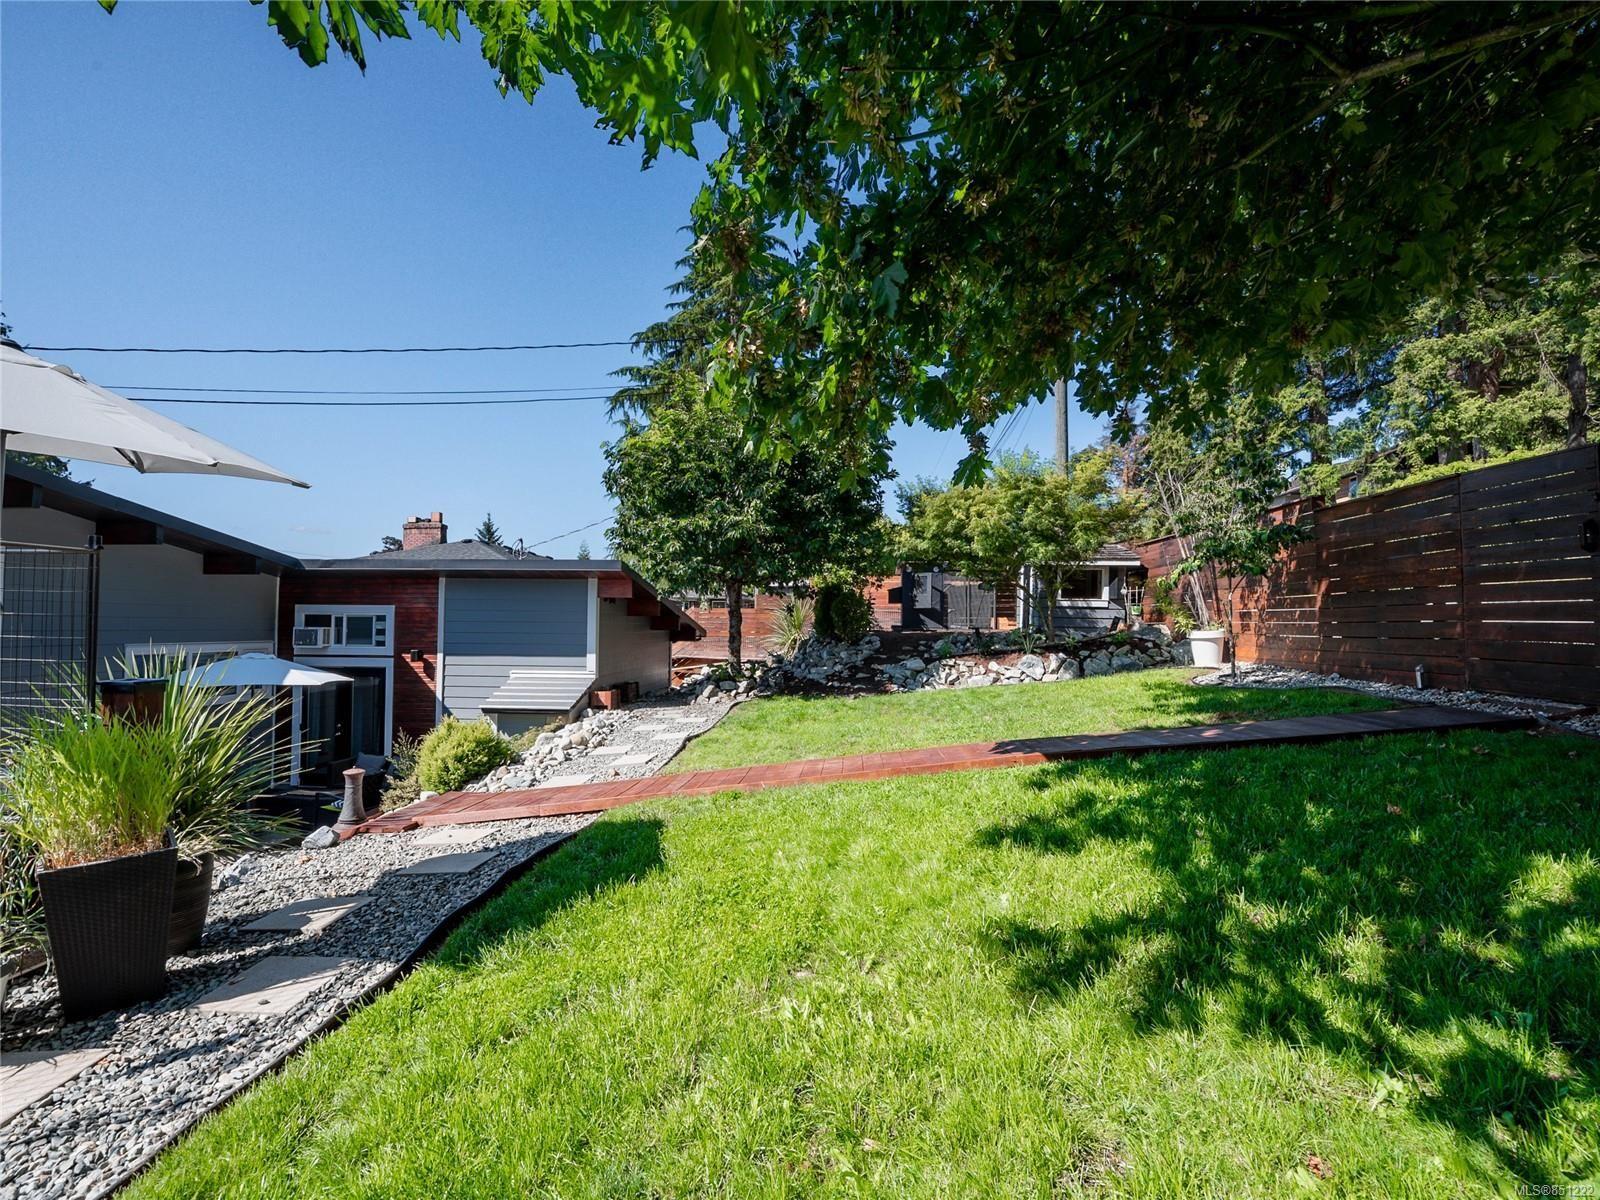 Photo 38: Photos: 2525 11th Ave in : PA Port Alberni House for sale (Port Alberni)  : MLS®# 851222